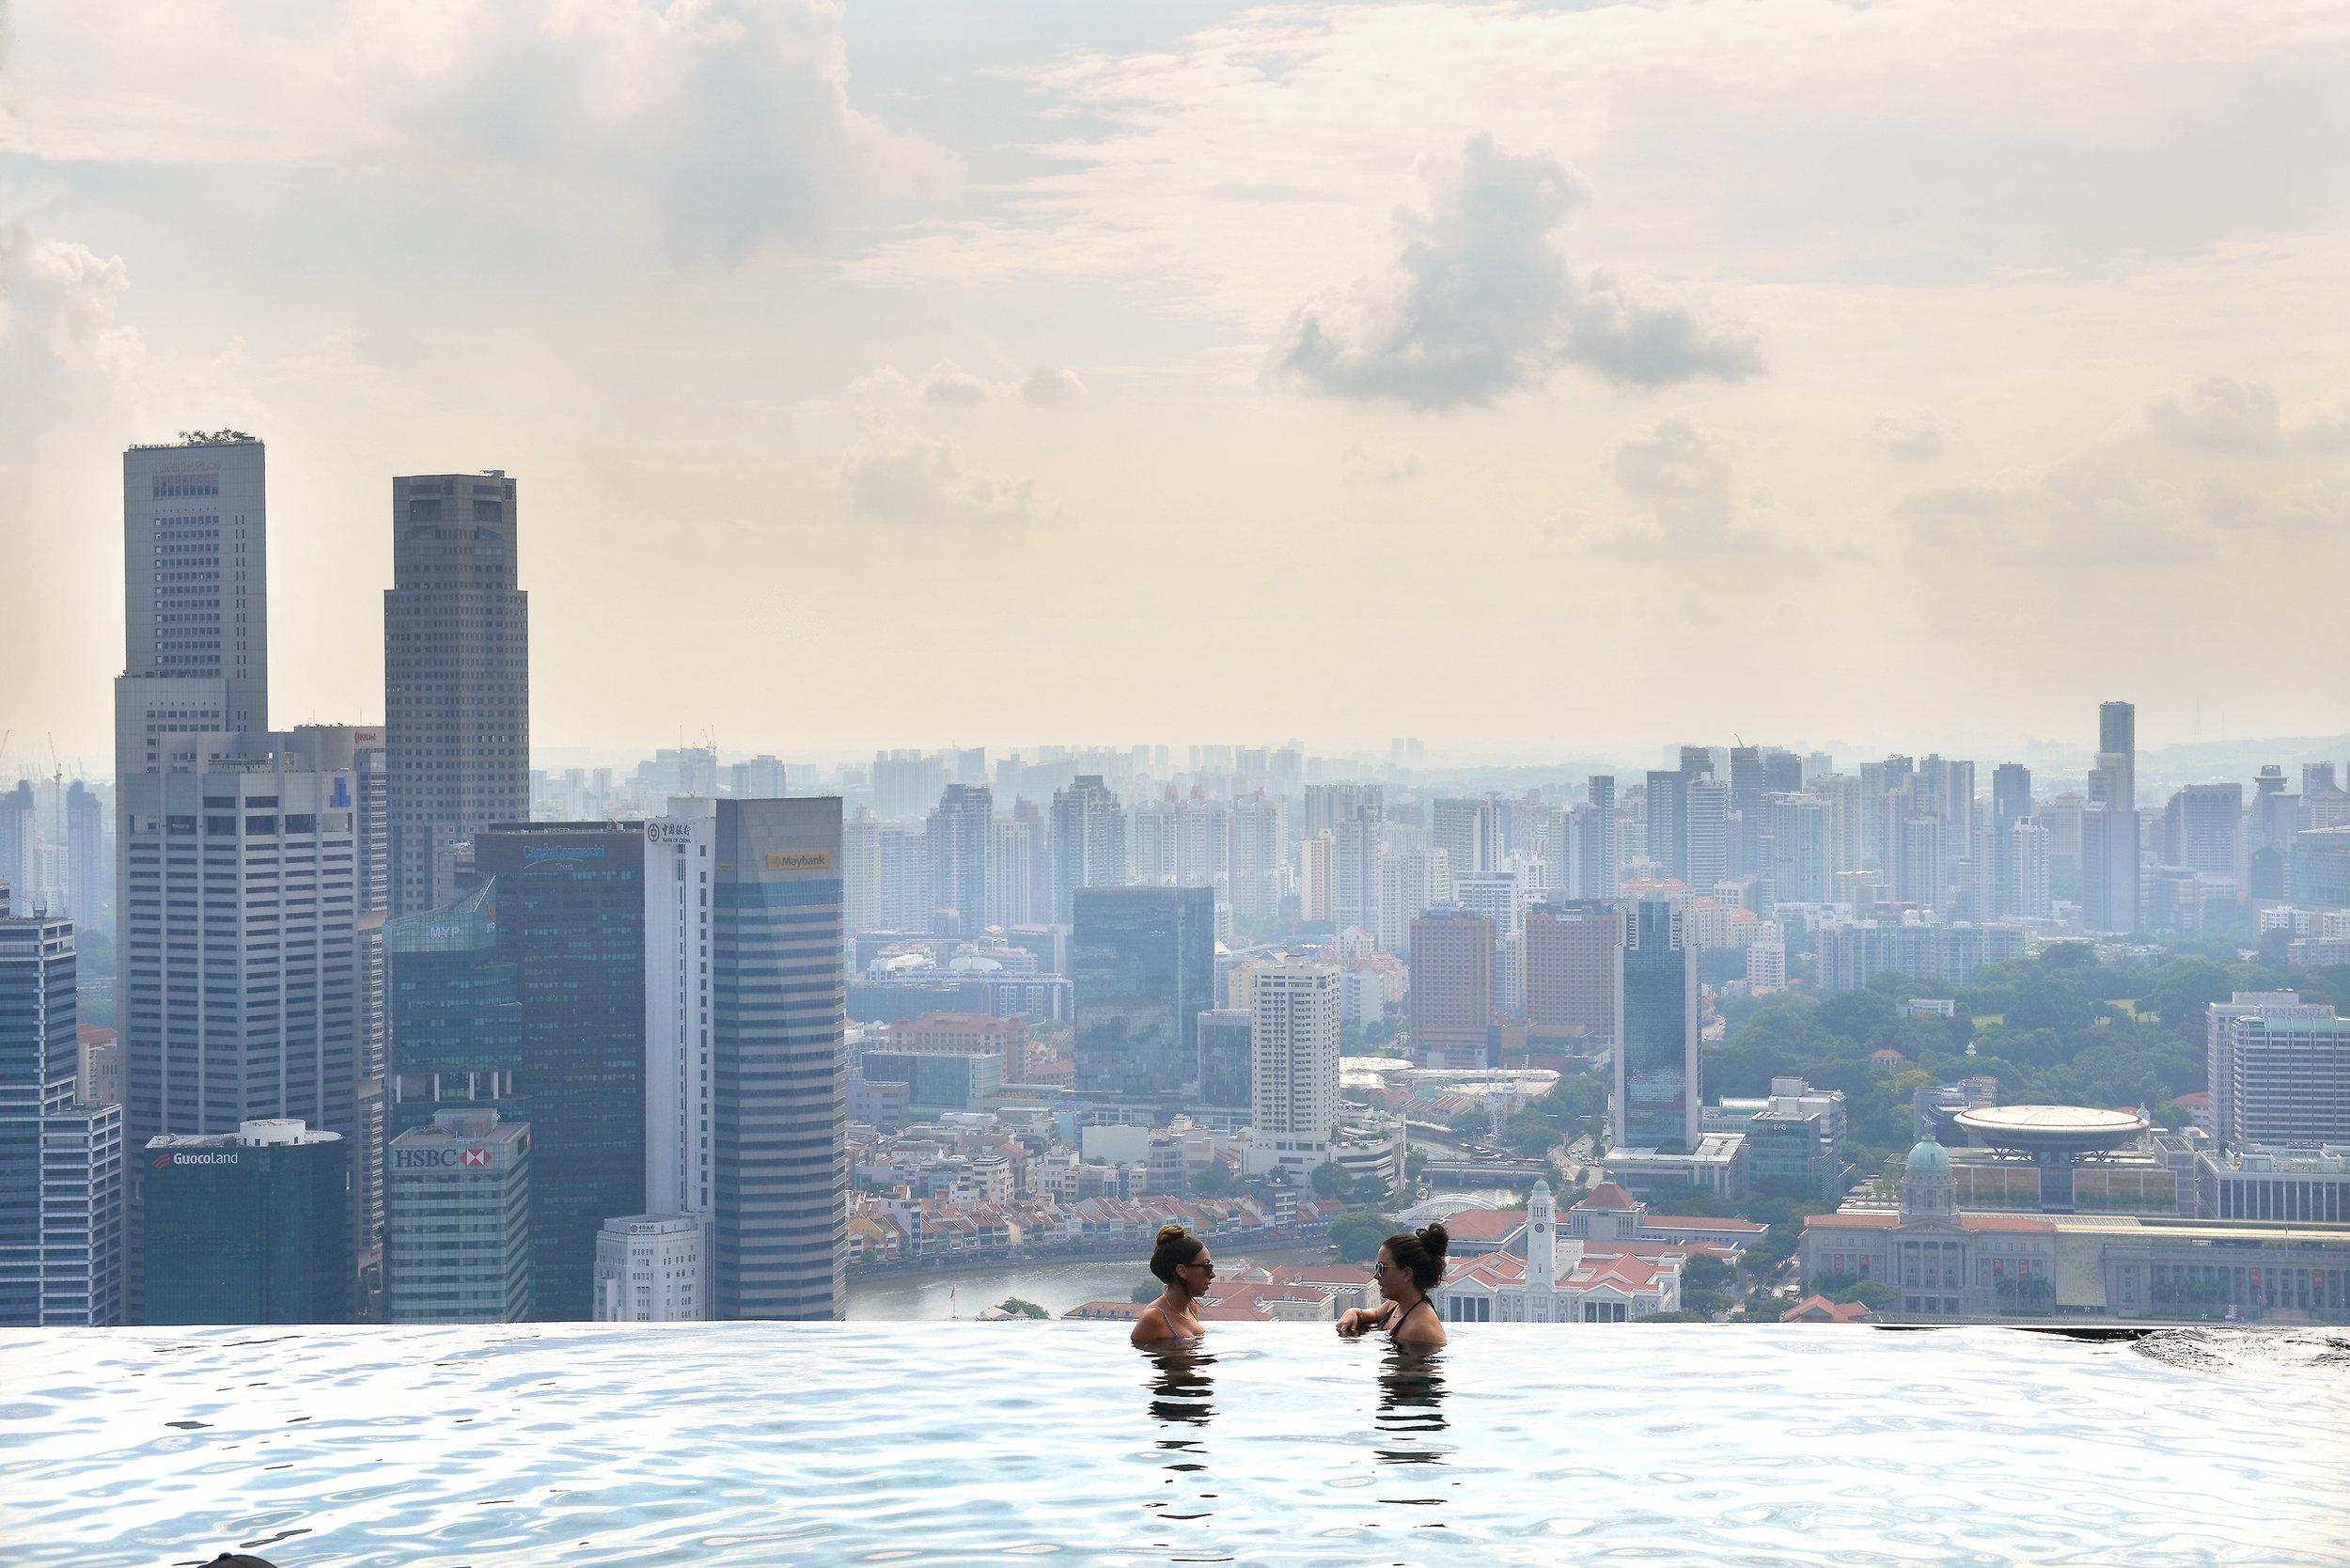 Singapore, Marina Bay Sands, hotelli